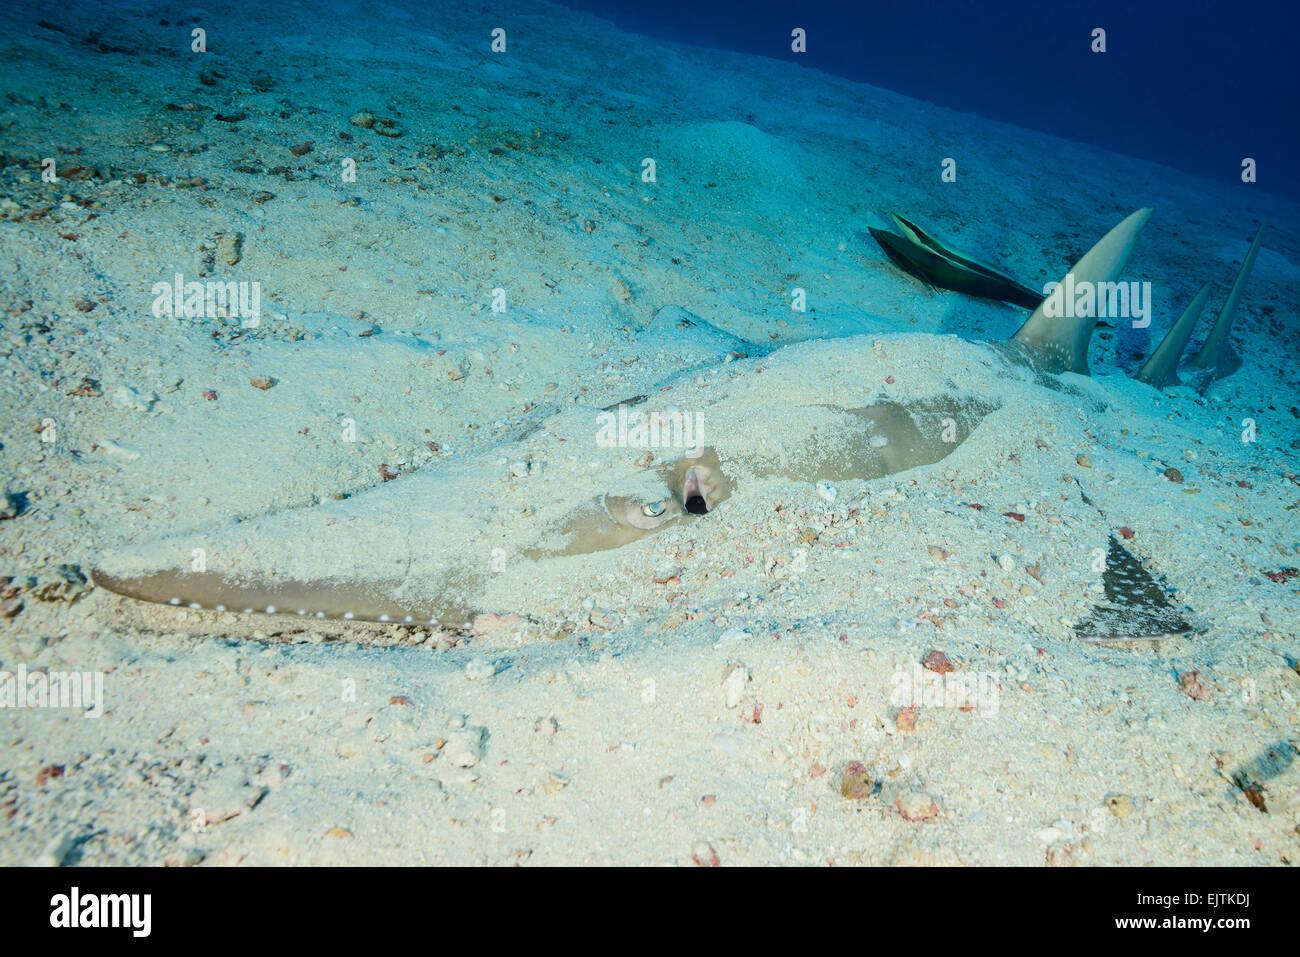 Rhynchobatus djiddensis, Giant guitarfish, Fish Head, Ari Atoll, Maldives, Indian Ocean - Stock Image